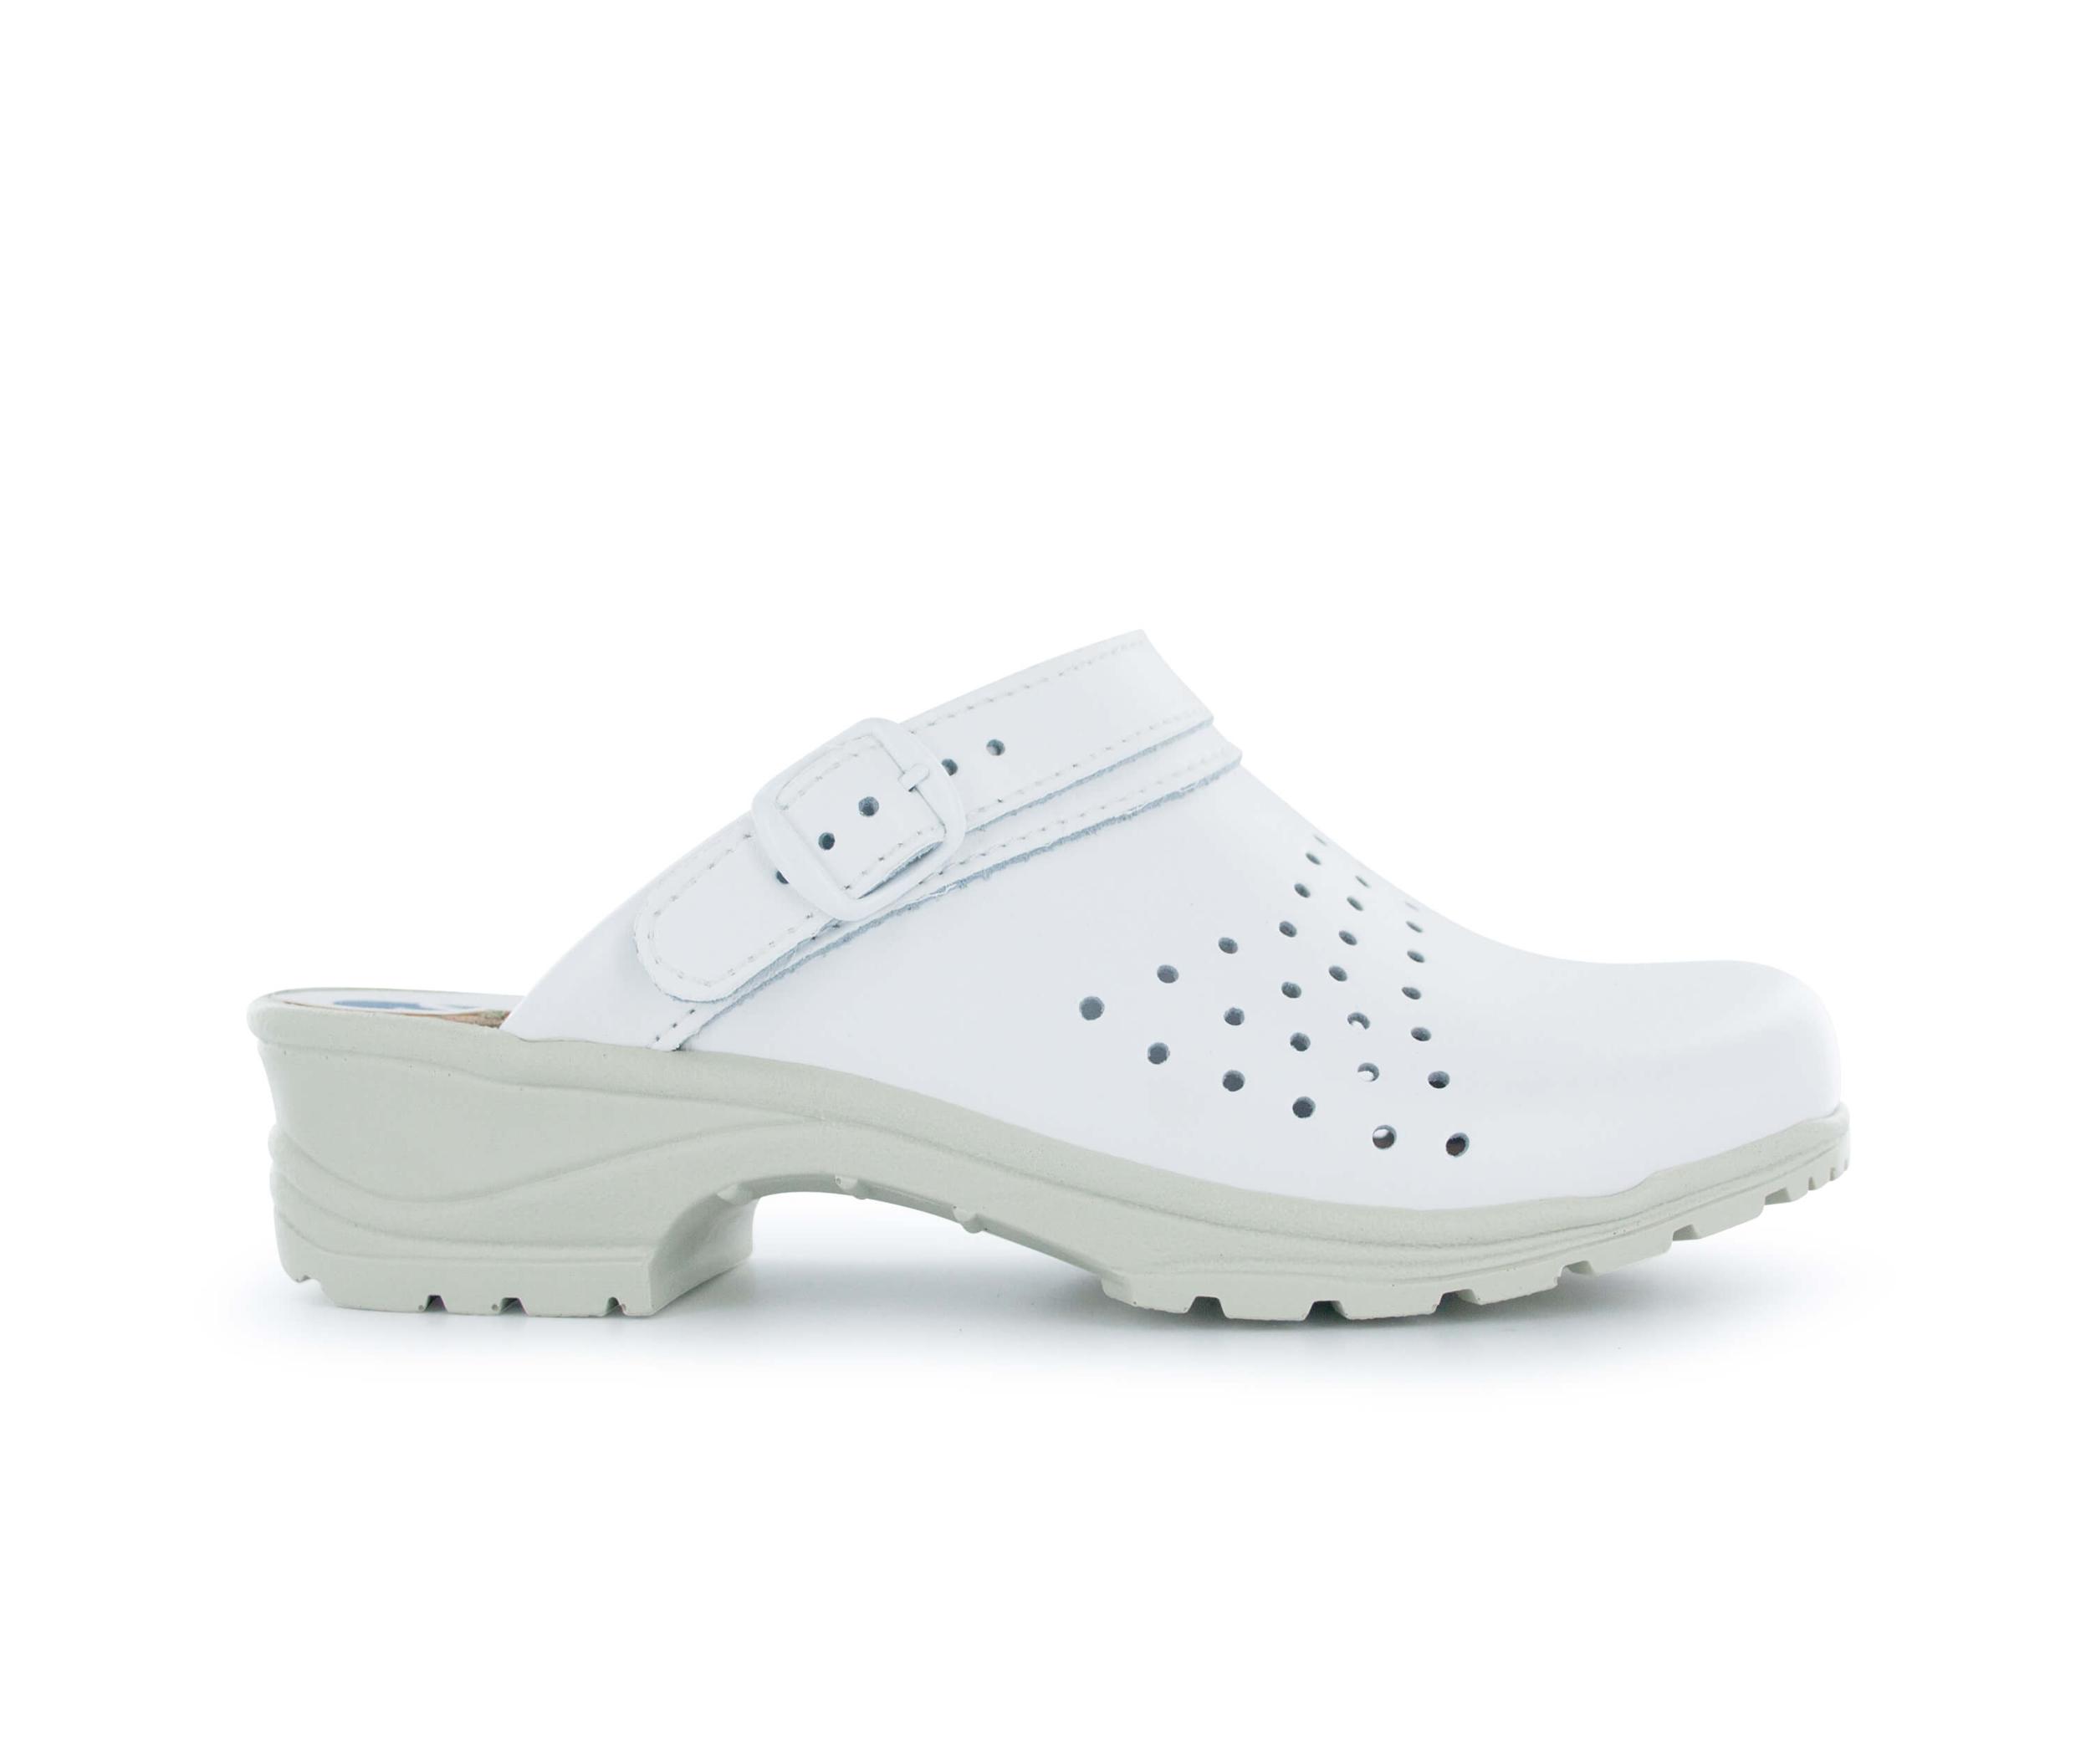 Mylookpro Et Médical Chers Chaussures Sabot Pas Hopital TlKJcF1